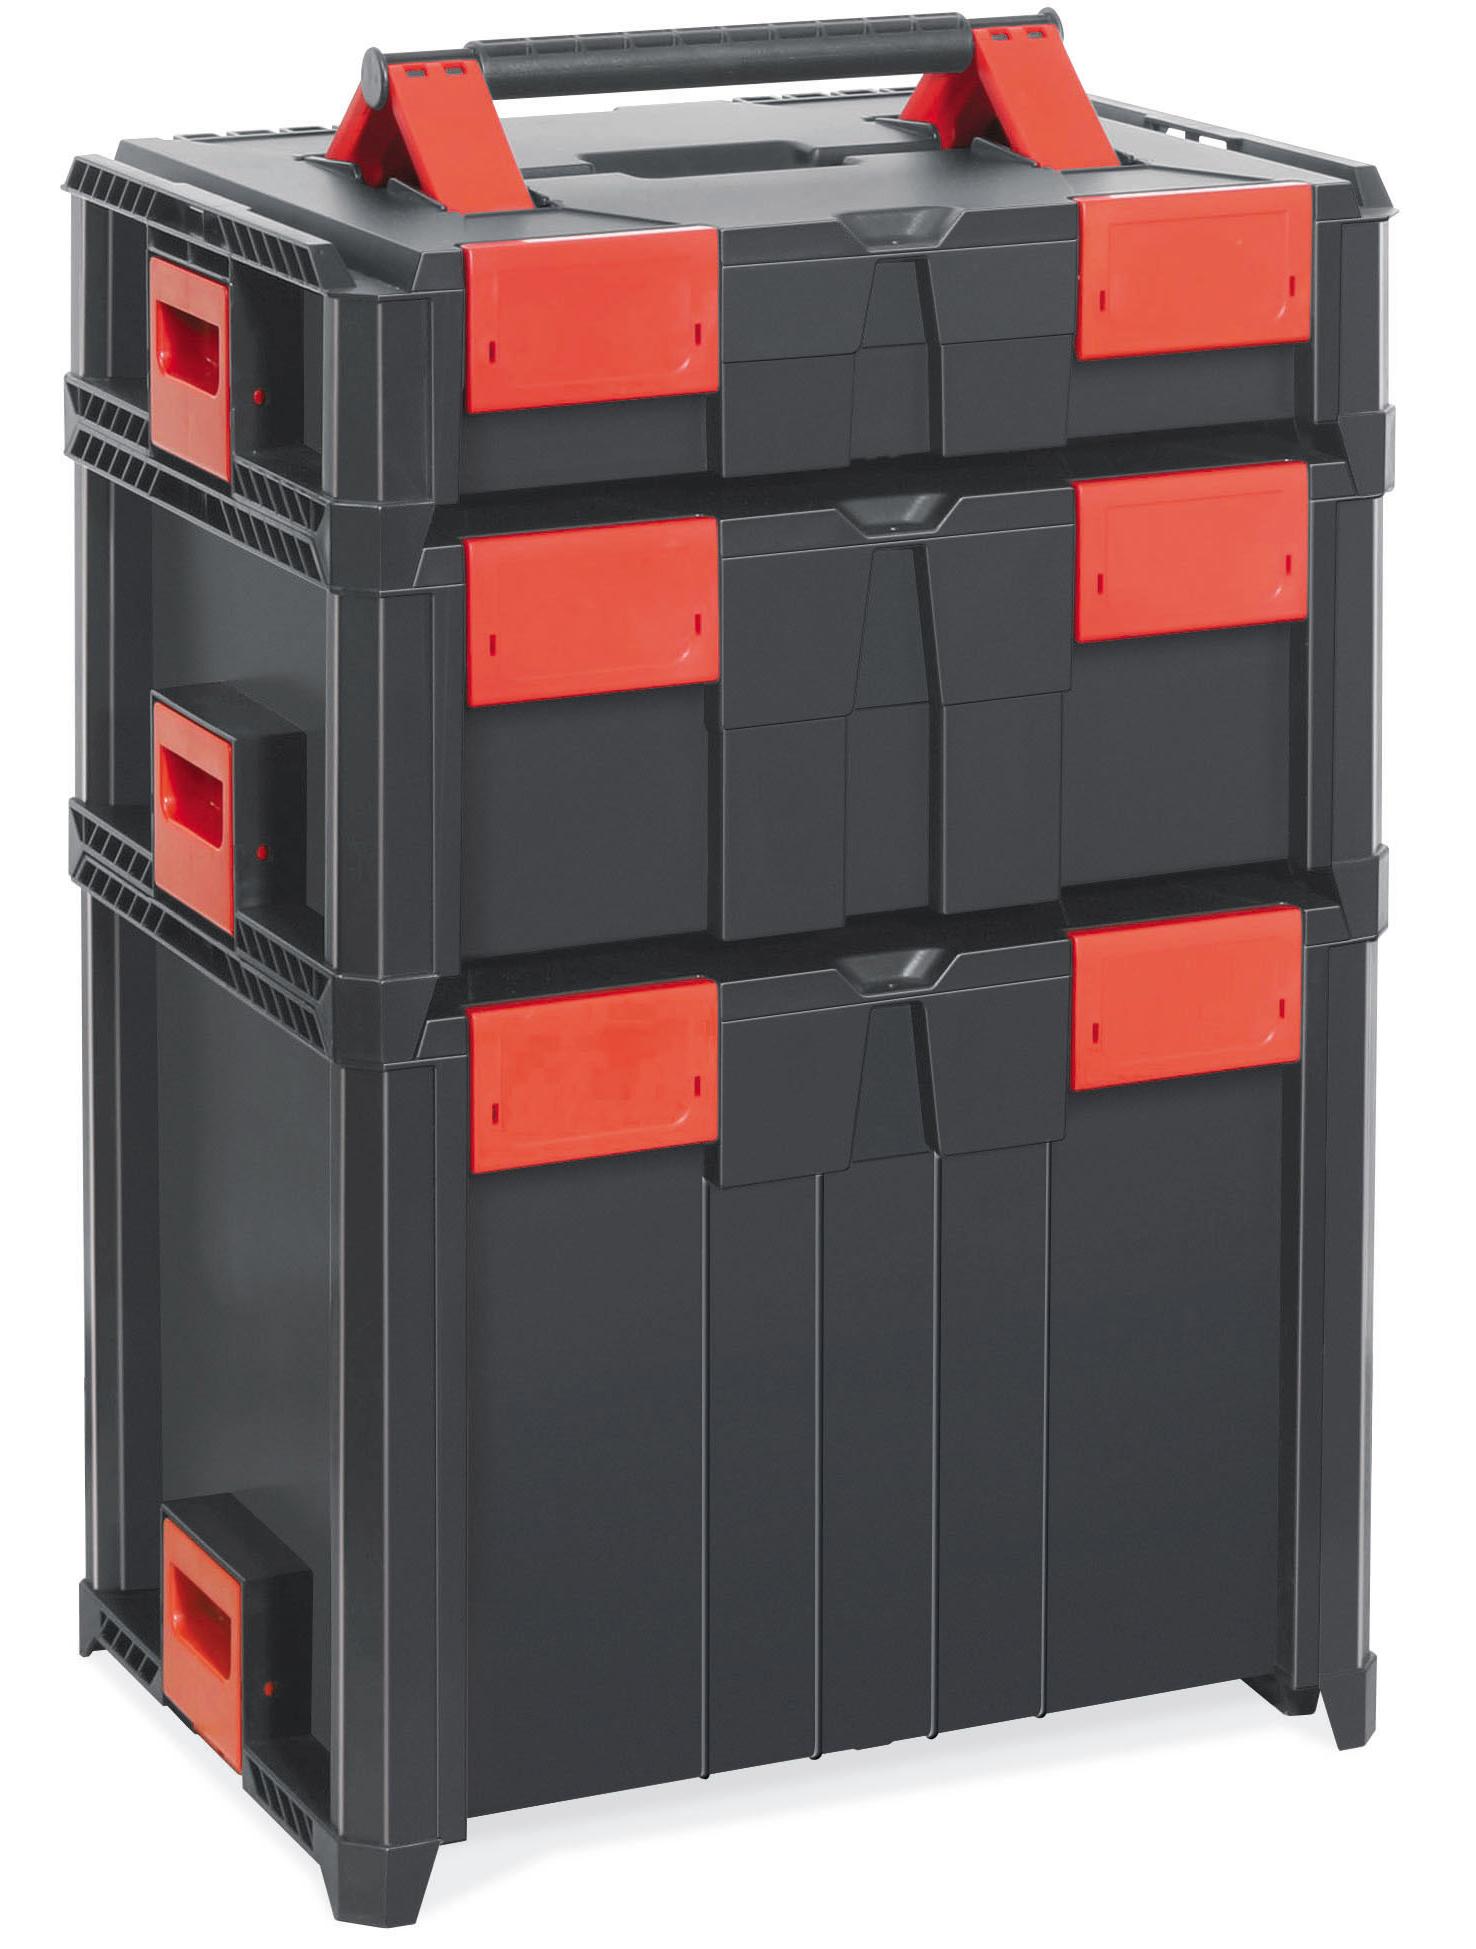 Box on Box